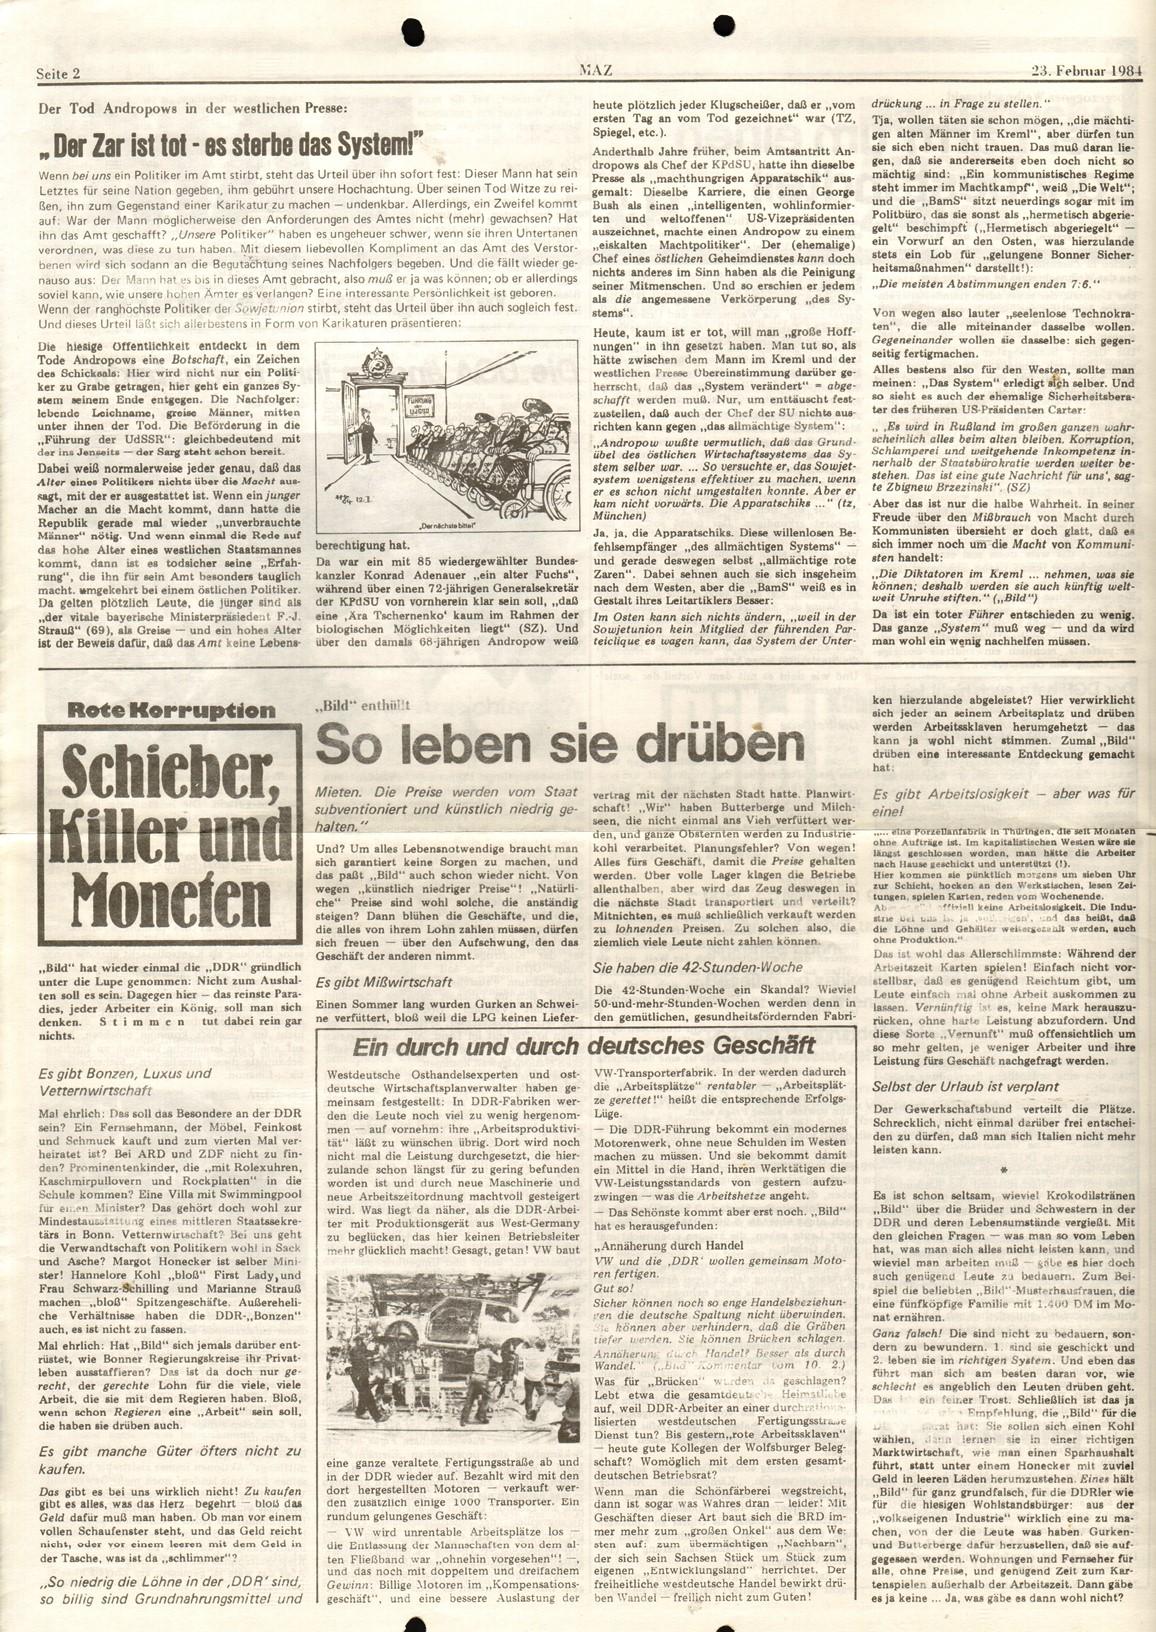 Erlangen_MG_MAZ_F_H_19840223_02